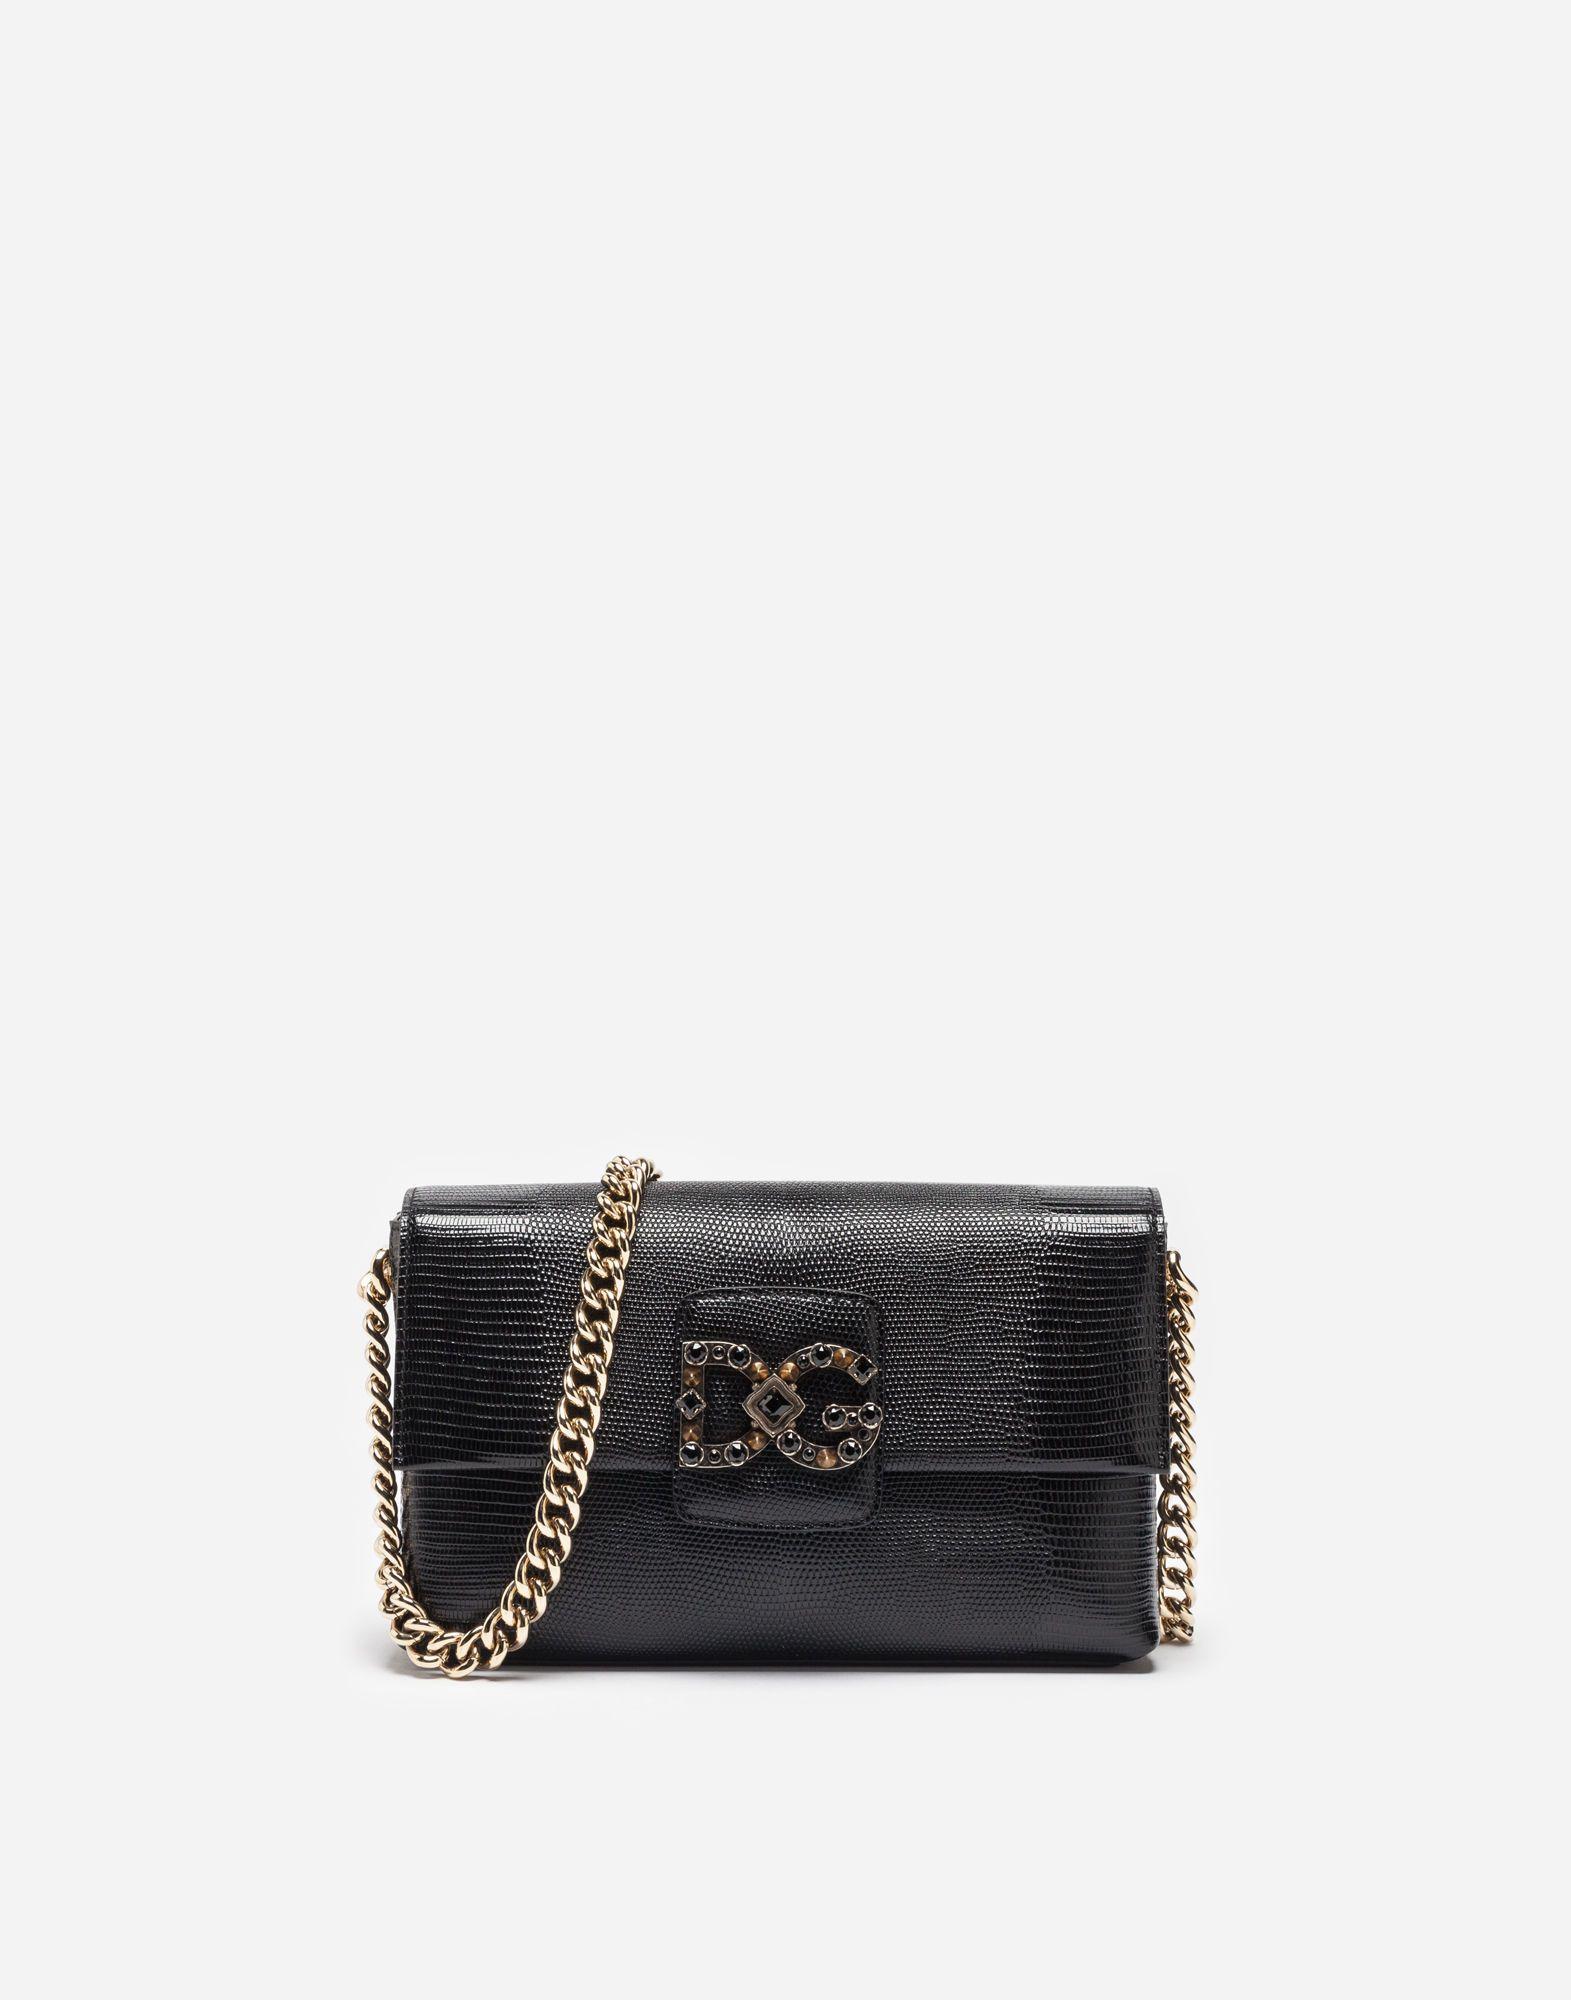 DOLCE   GABBANA Dg Millennials Bag In Leather.  dolcegabbana  bags   shoulder bags  leather  cotton  crystal   b93c1949ba